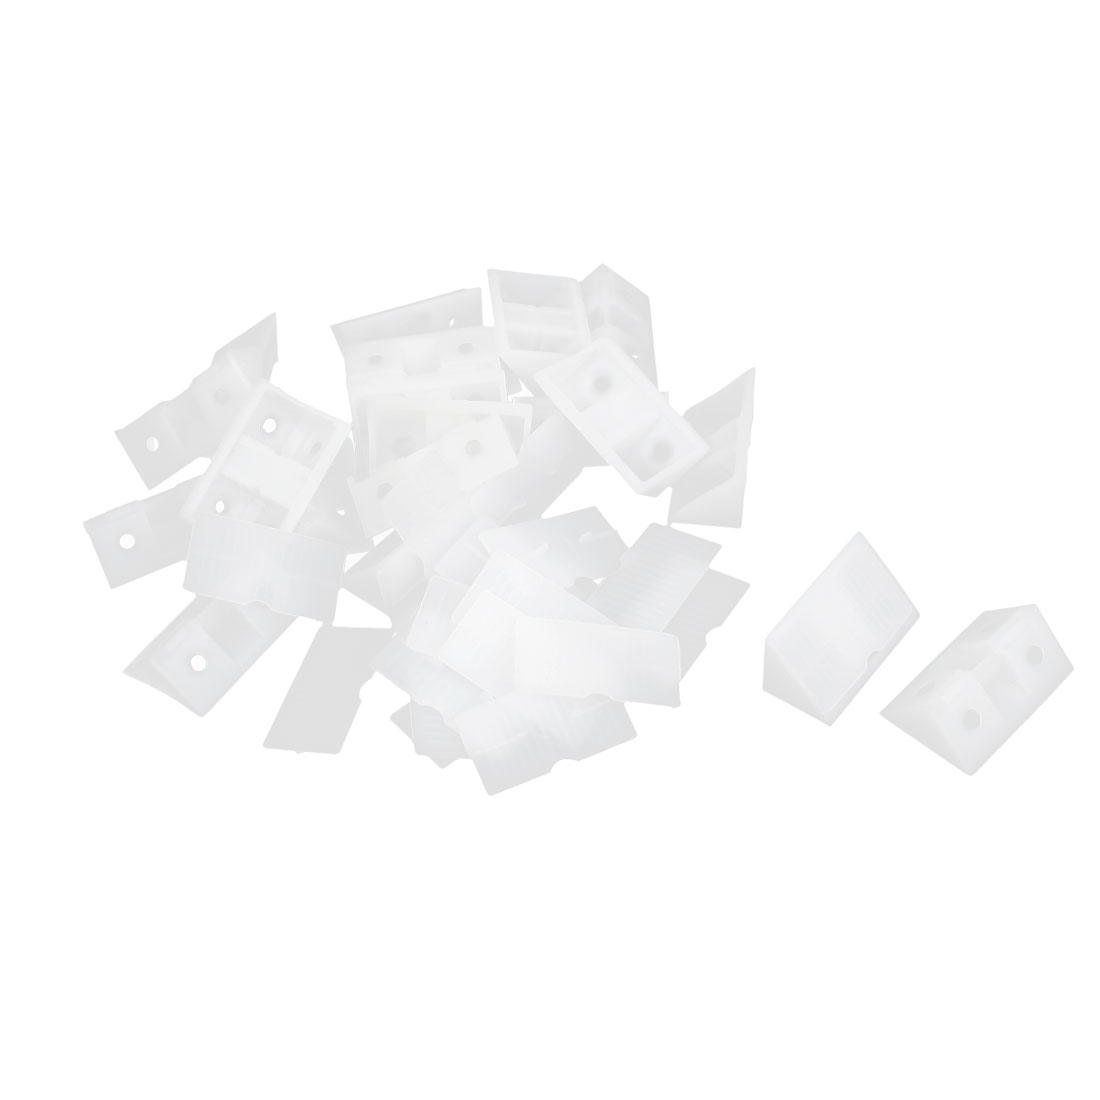 Shelf Closet Plastic Corner Braces Angle Brackets Furniture Assembly White 20pcs